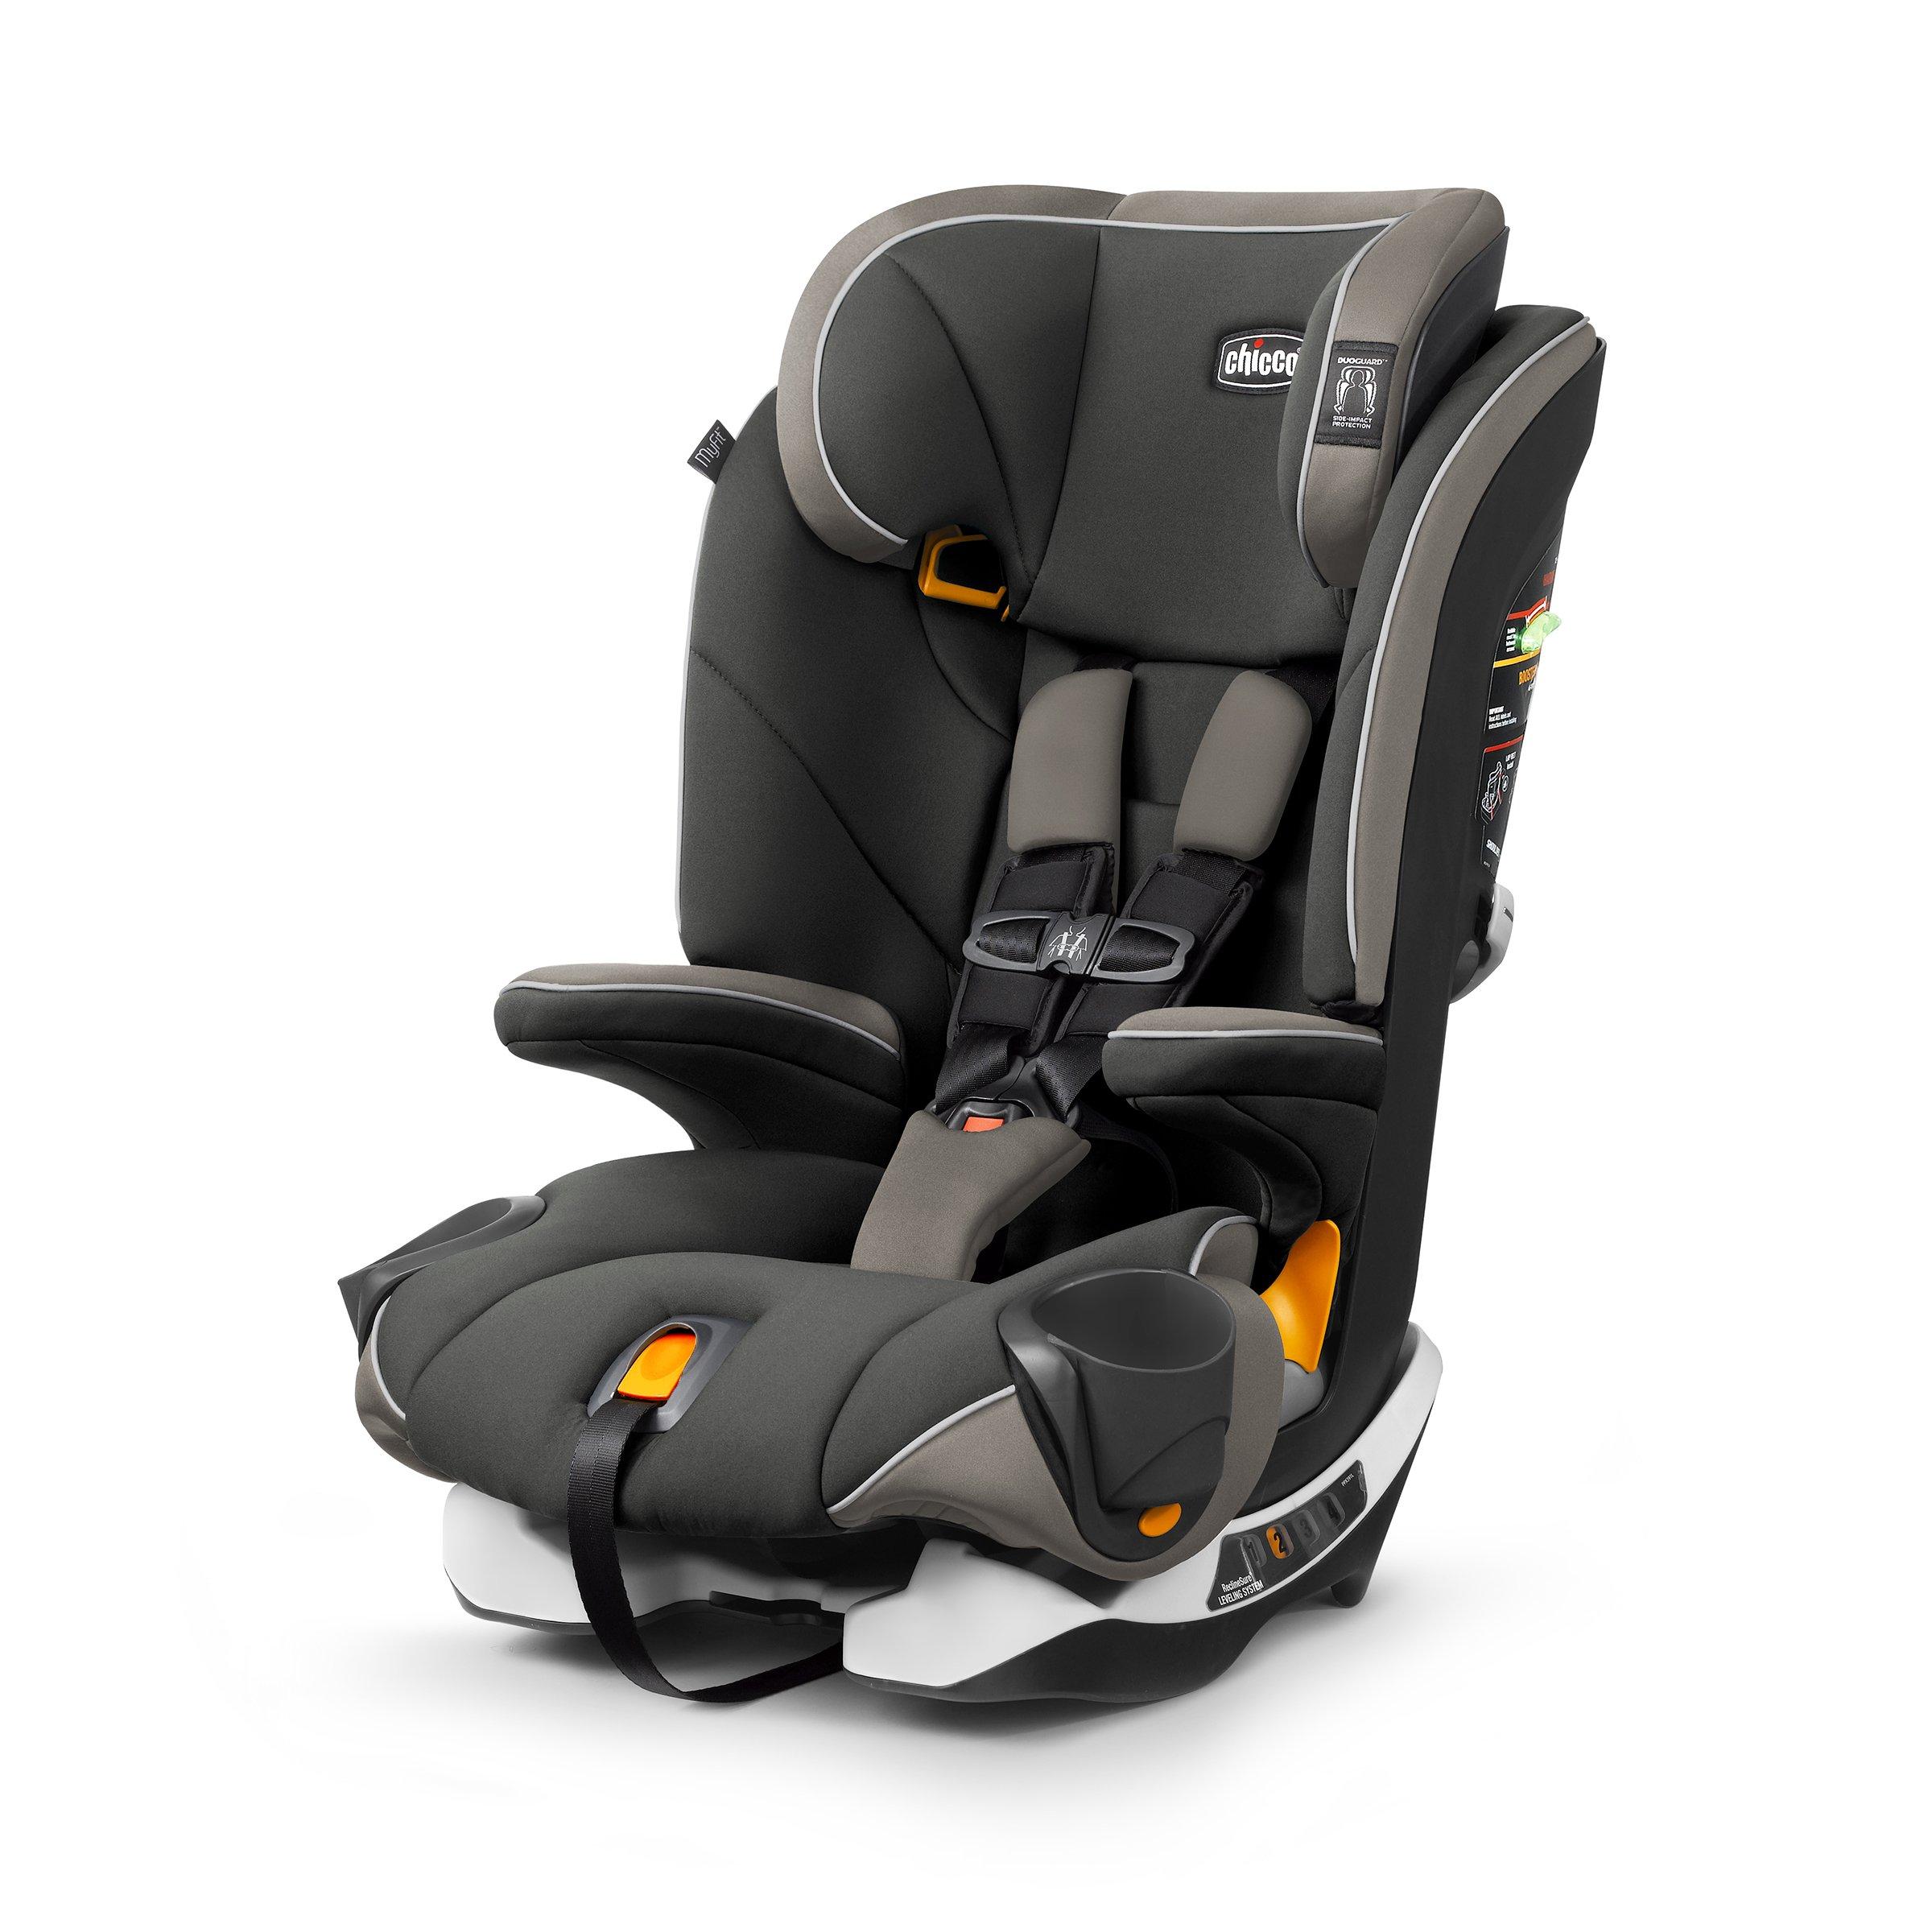 chicco nextfit convertible car seat matrix baby. Black Bedroom Furniture Sets. Home Design Ideas